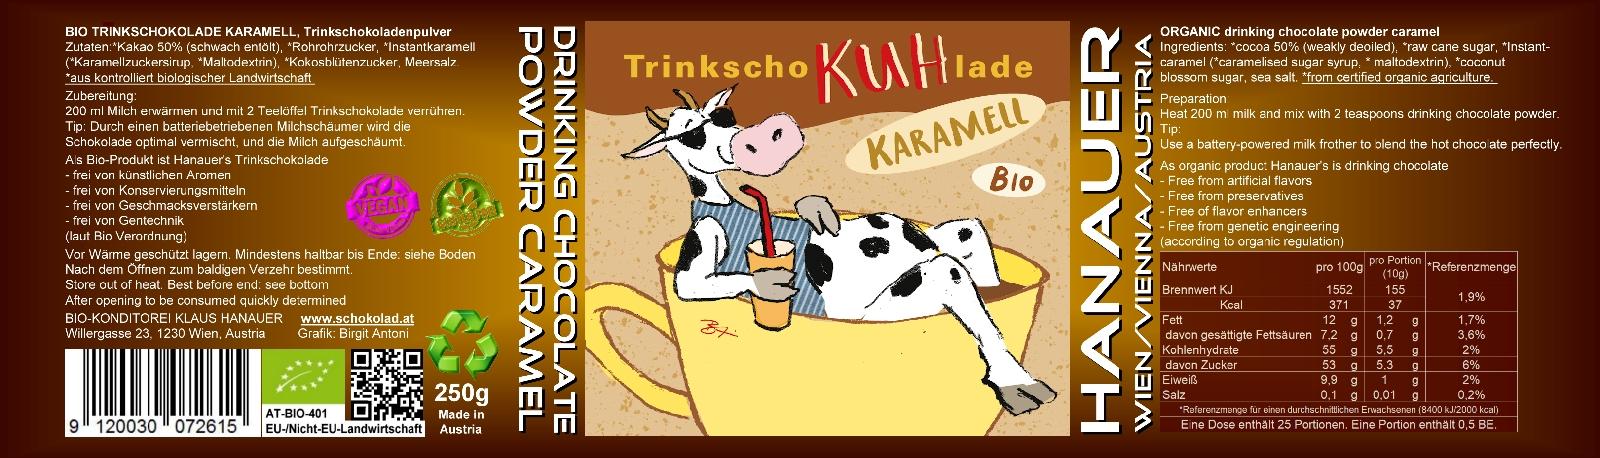 Bio Trink SchoKUHlade Karamell Etikett